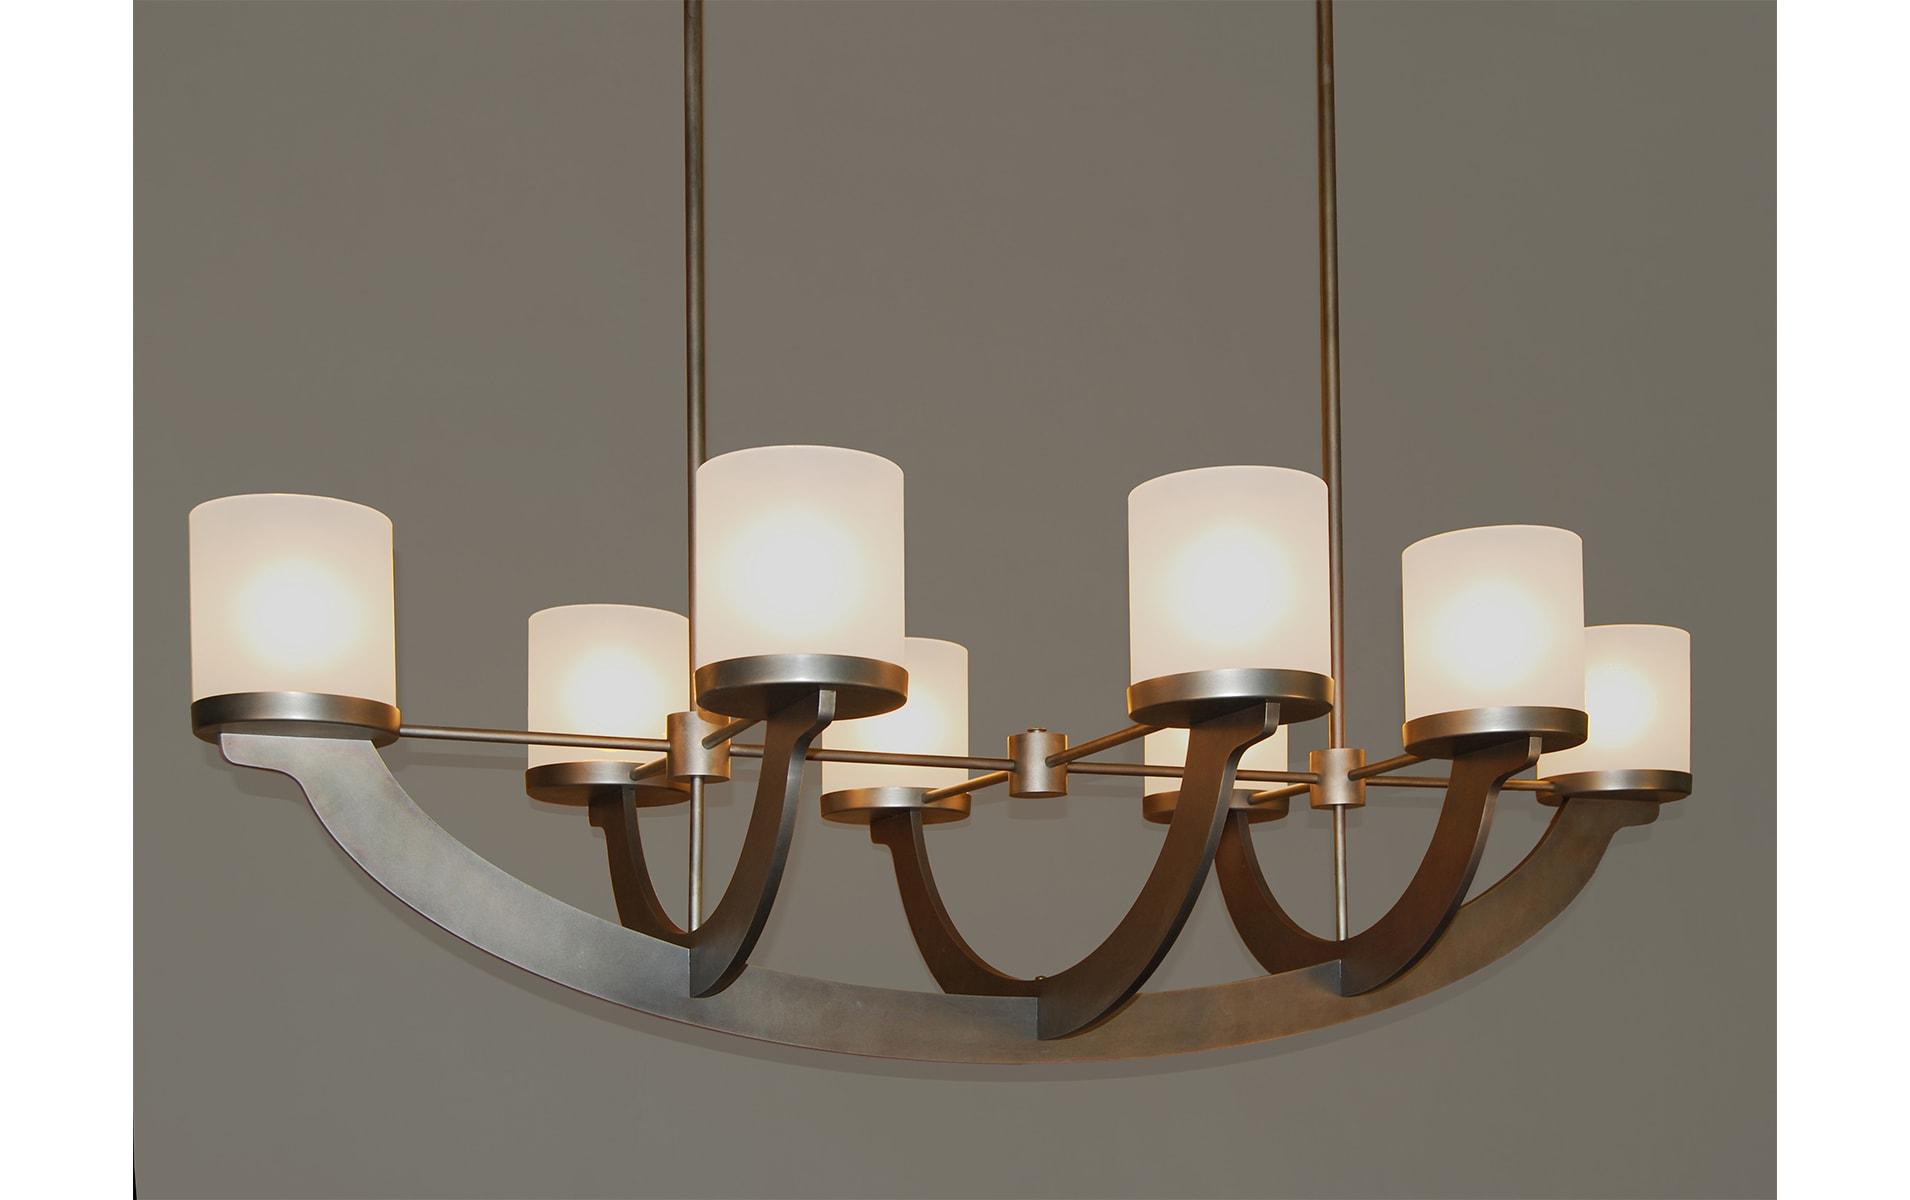 Baca eight arm chandelier tatiana tafur baca eight arm chandelier arubaitofo Choice Image